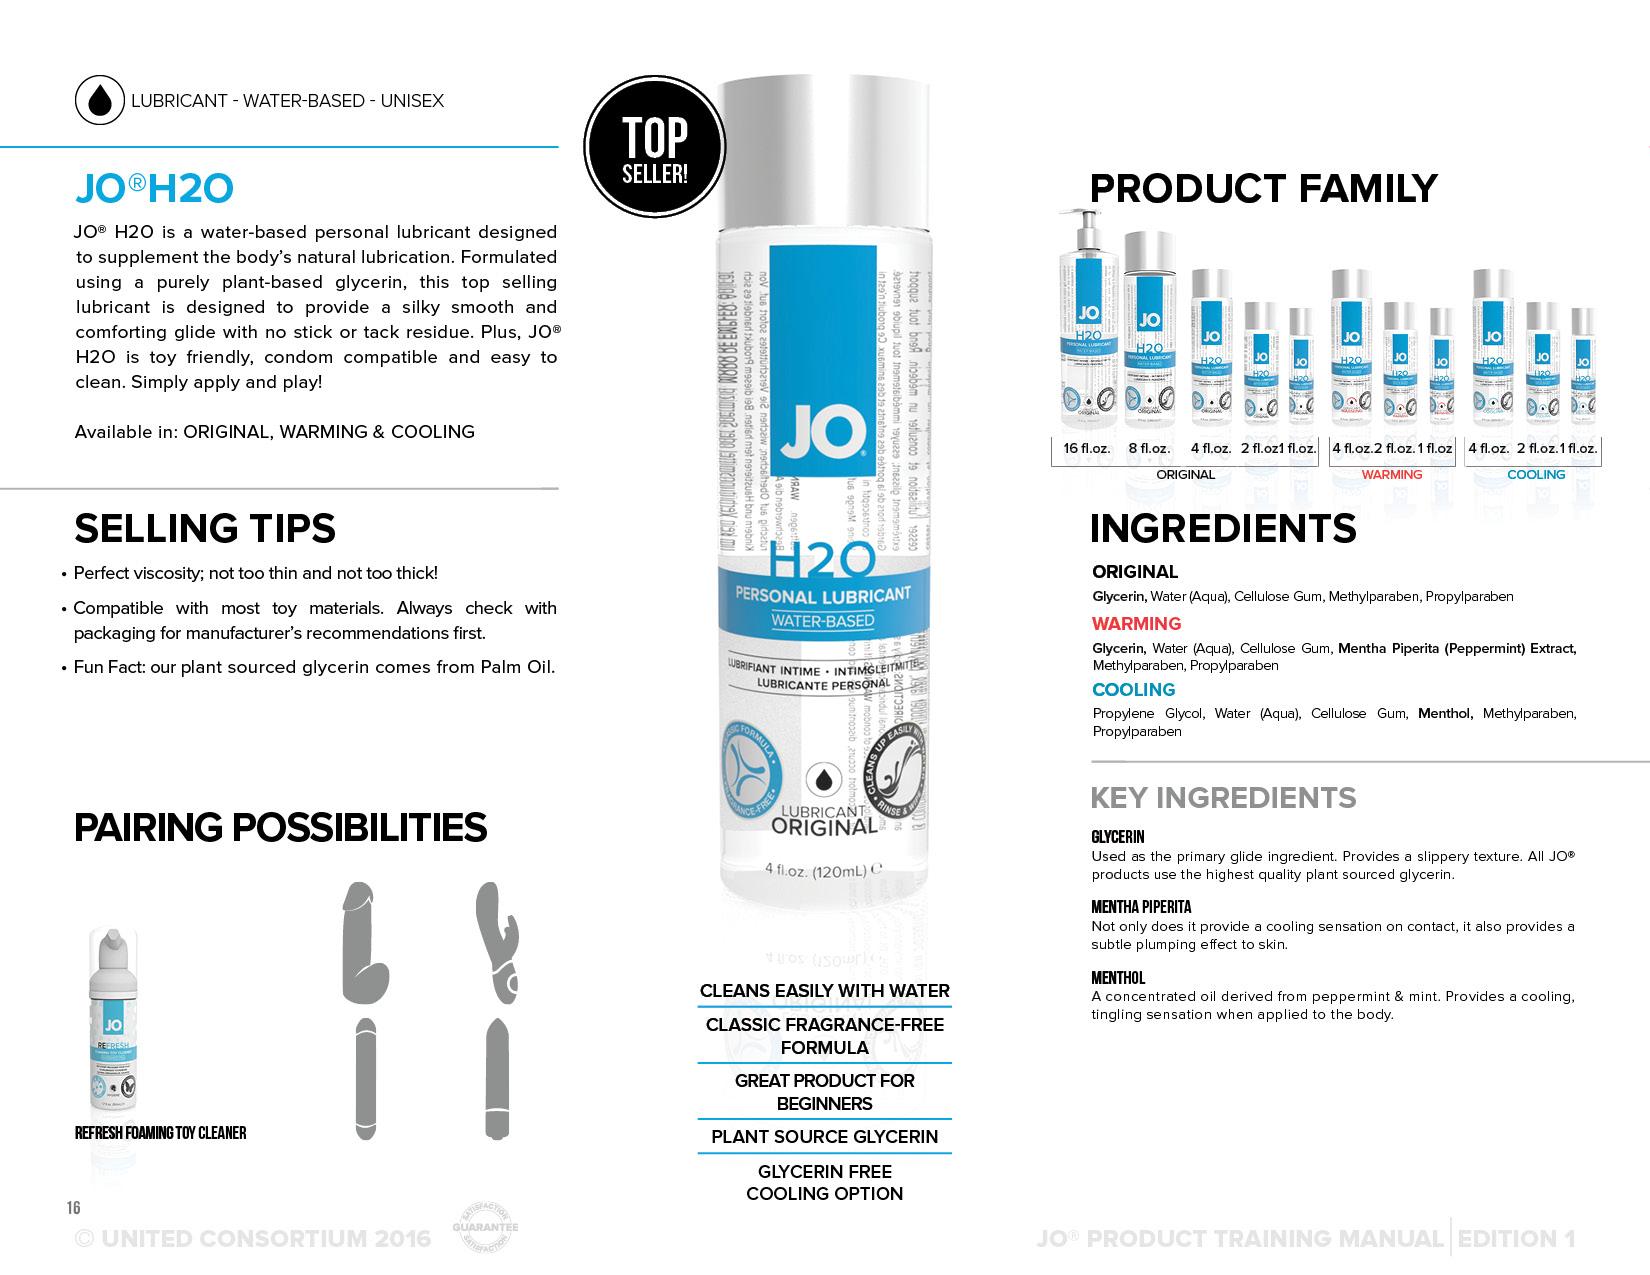 JO Product Training Manual v1.5_03.22.1516.jpg